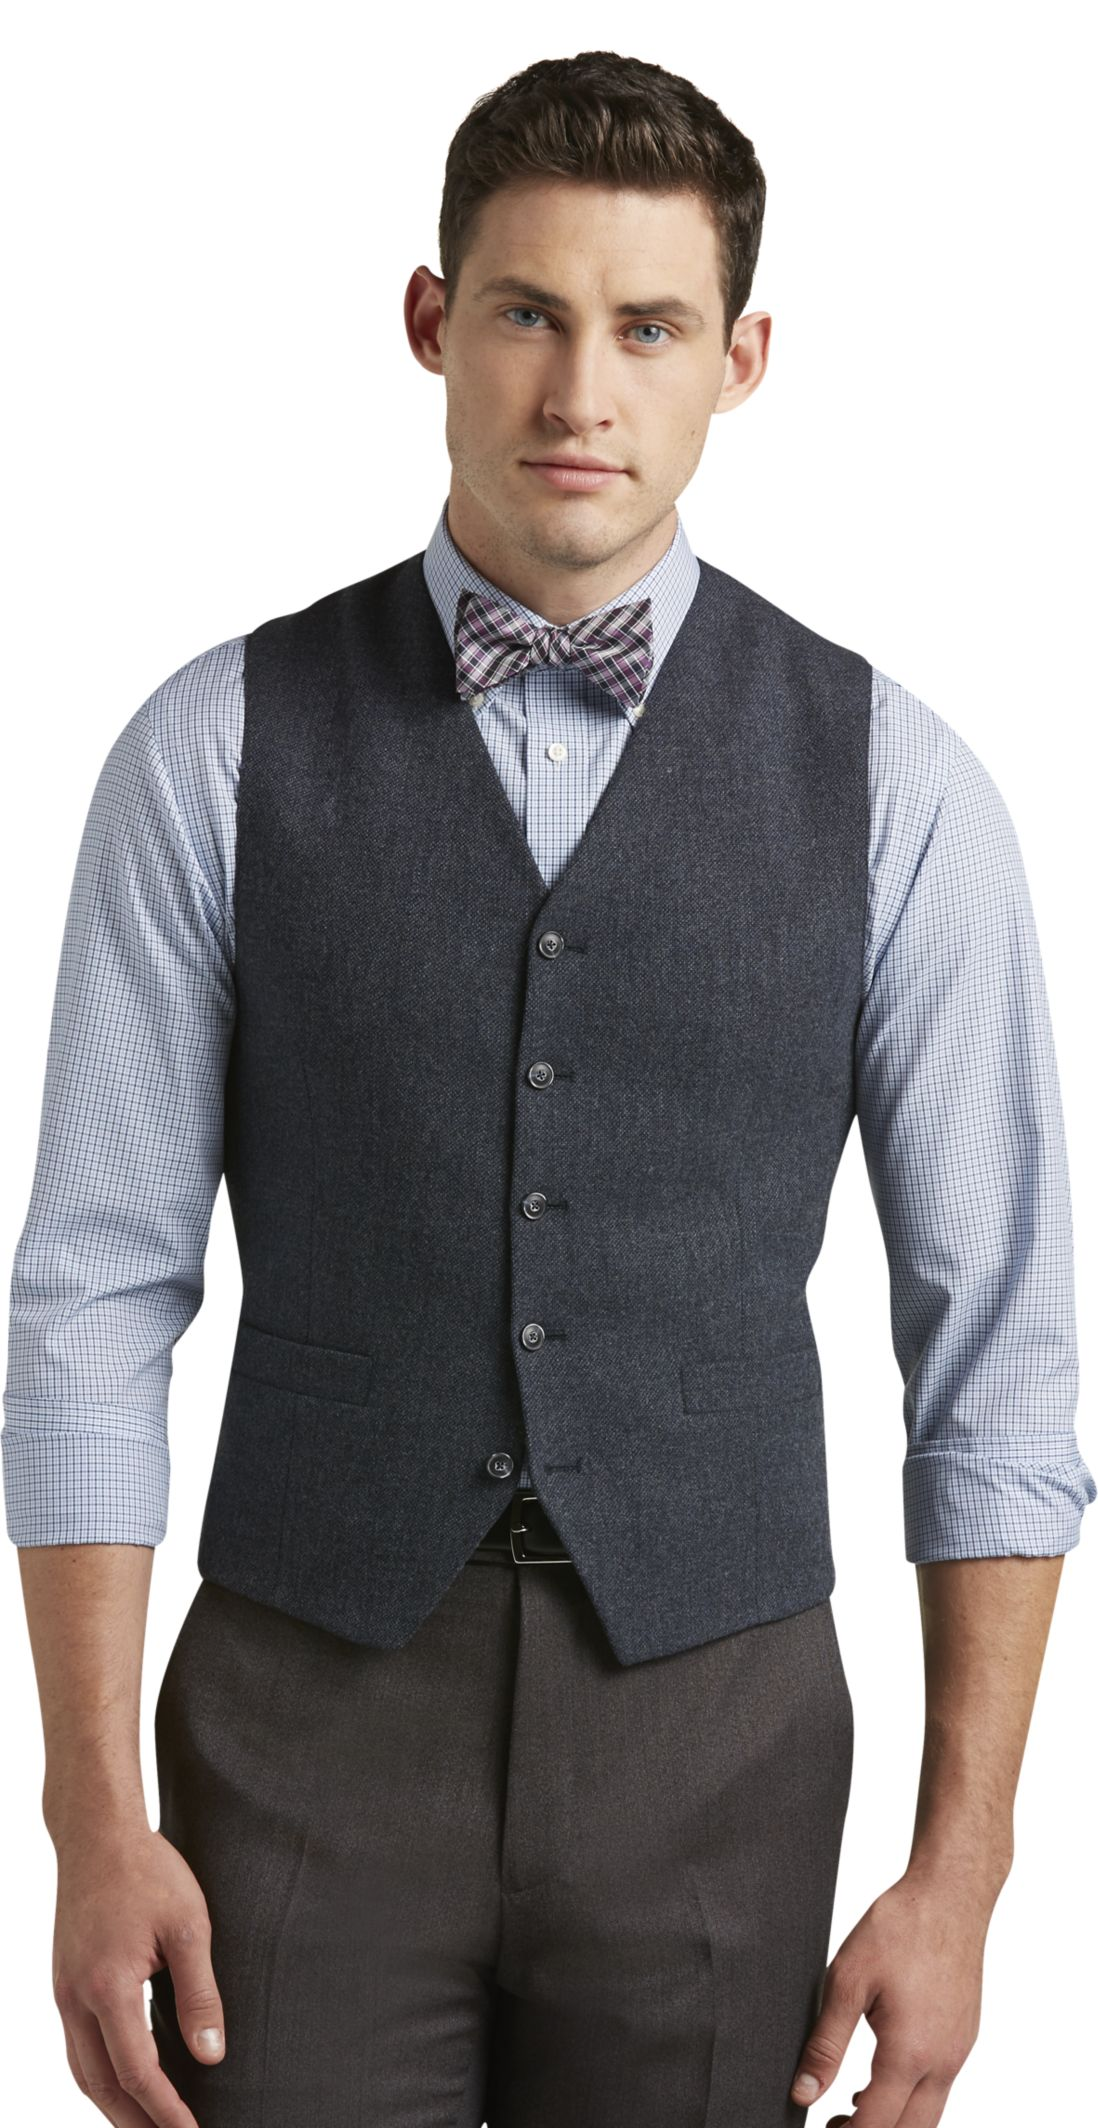 Men's Vests | Men's SportCoats | JoS. A. Bank Clothiers